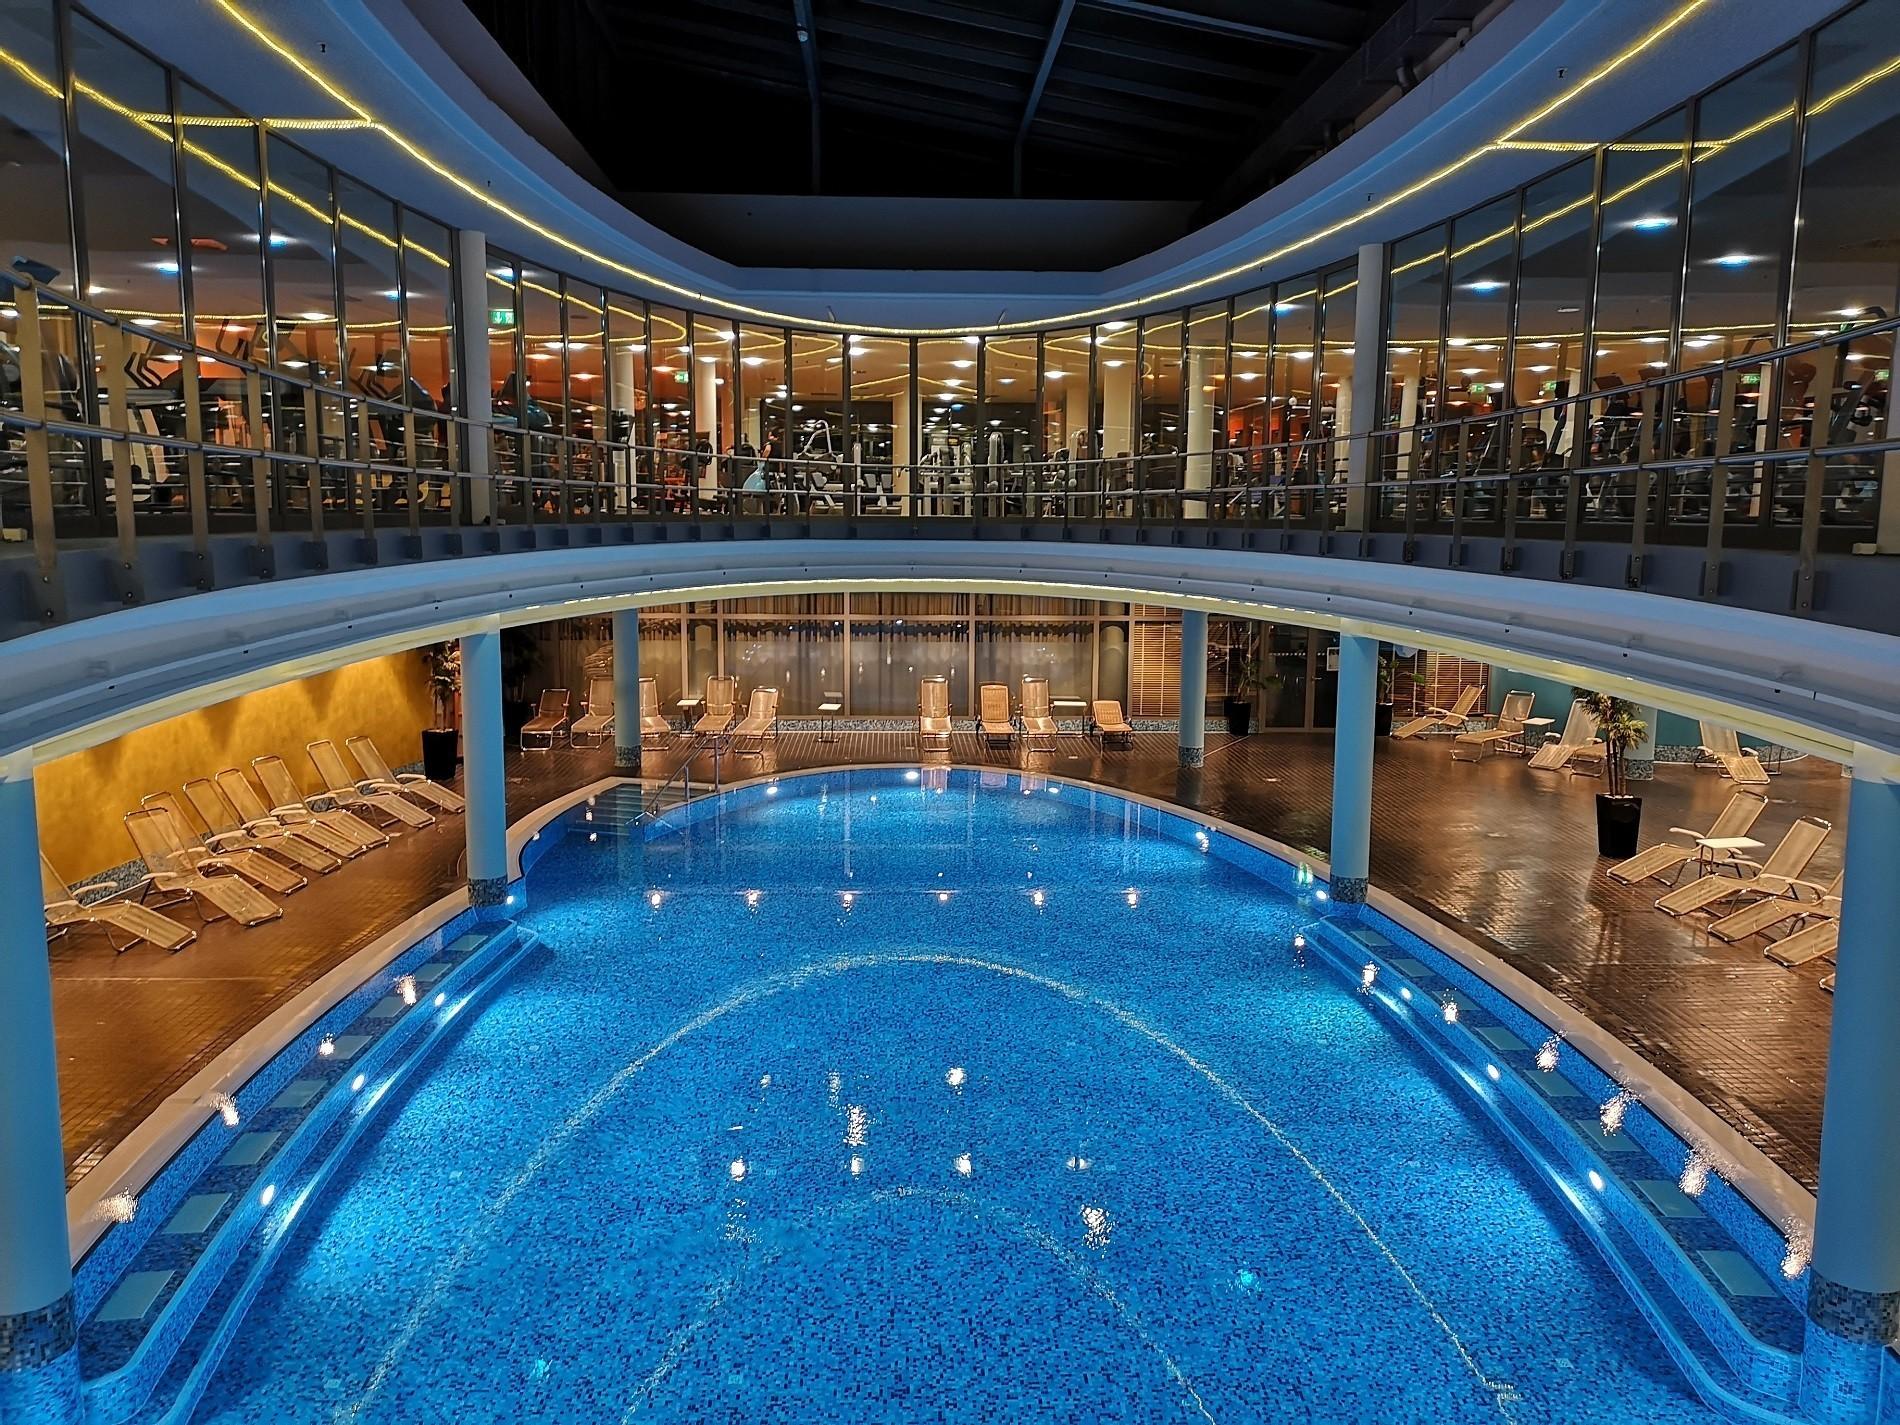 Pool im centrovital Hotel Berlin